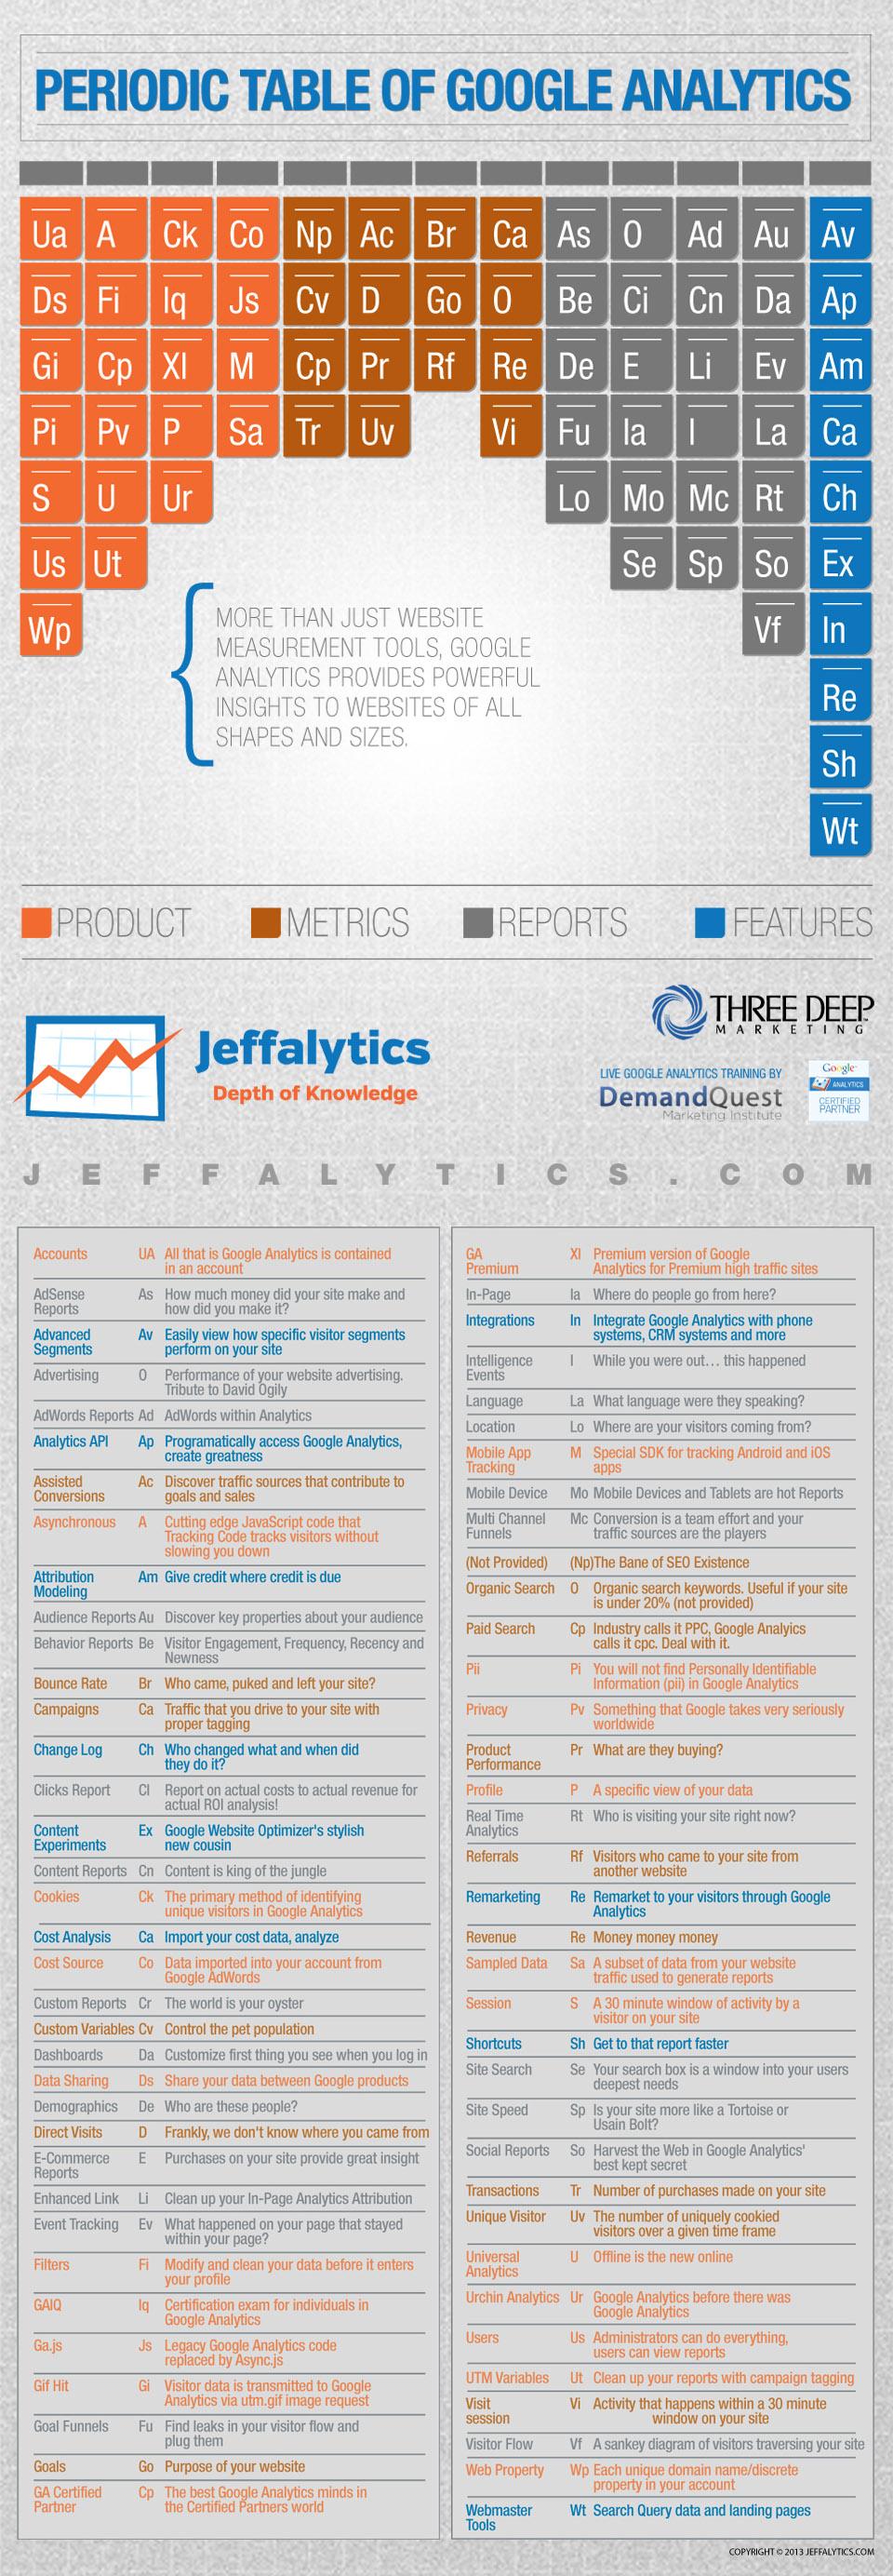 PeriodicTableGoogleAnalytics_Jeffalytics